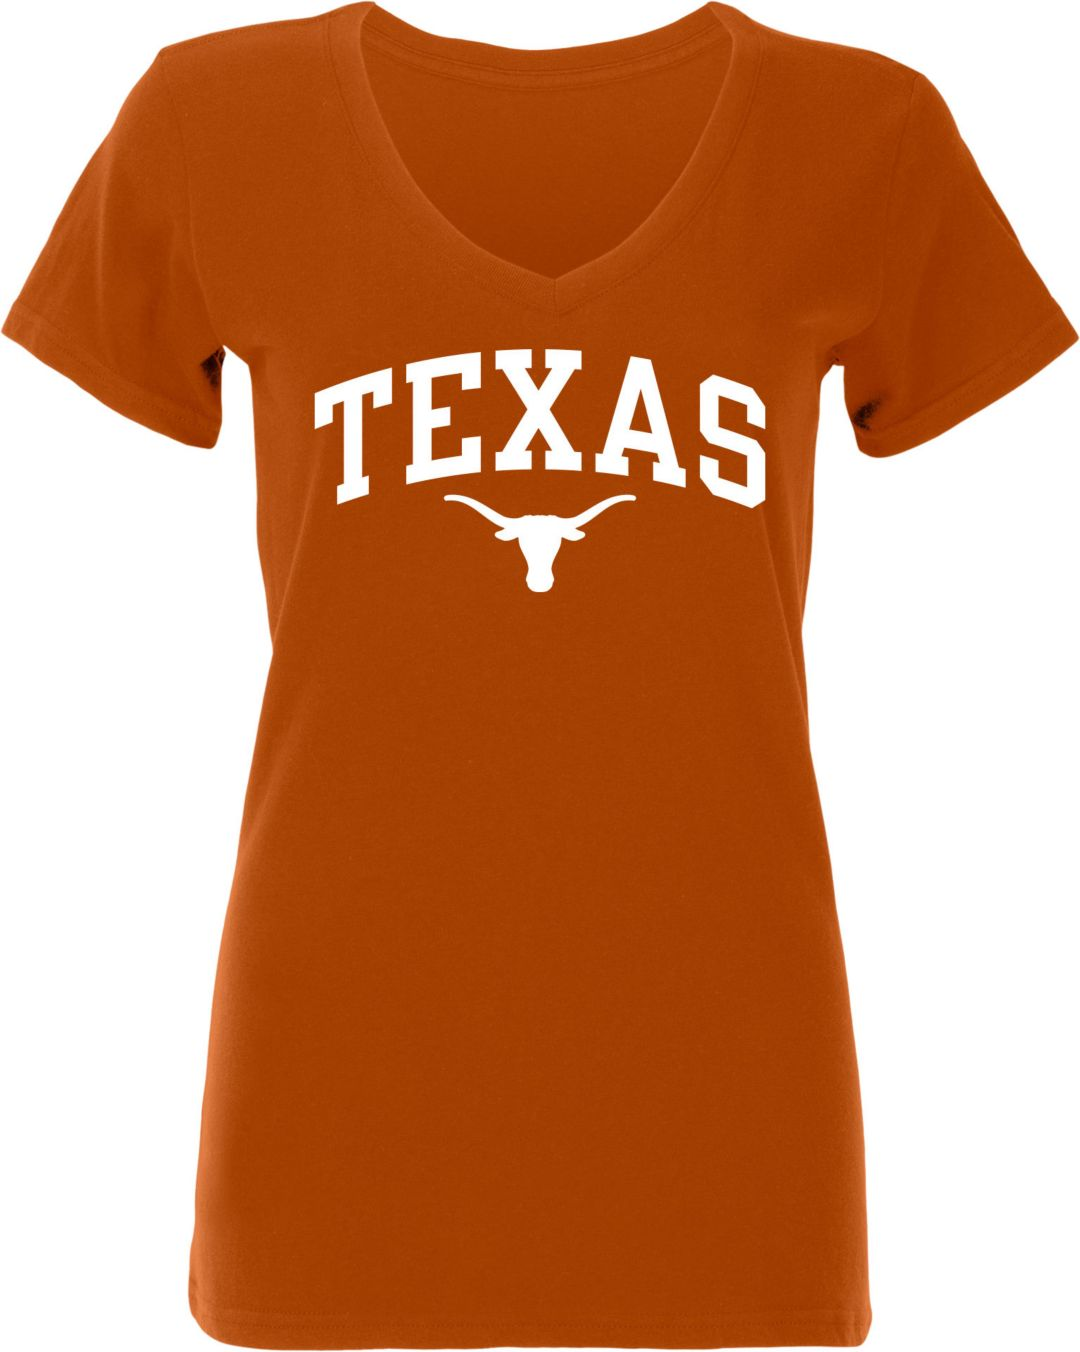 799a44e7 University of Texas Authentic Apparel Women's Texas Longhorns Burnt Orange  Arch V-Neck T-Shirt